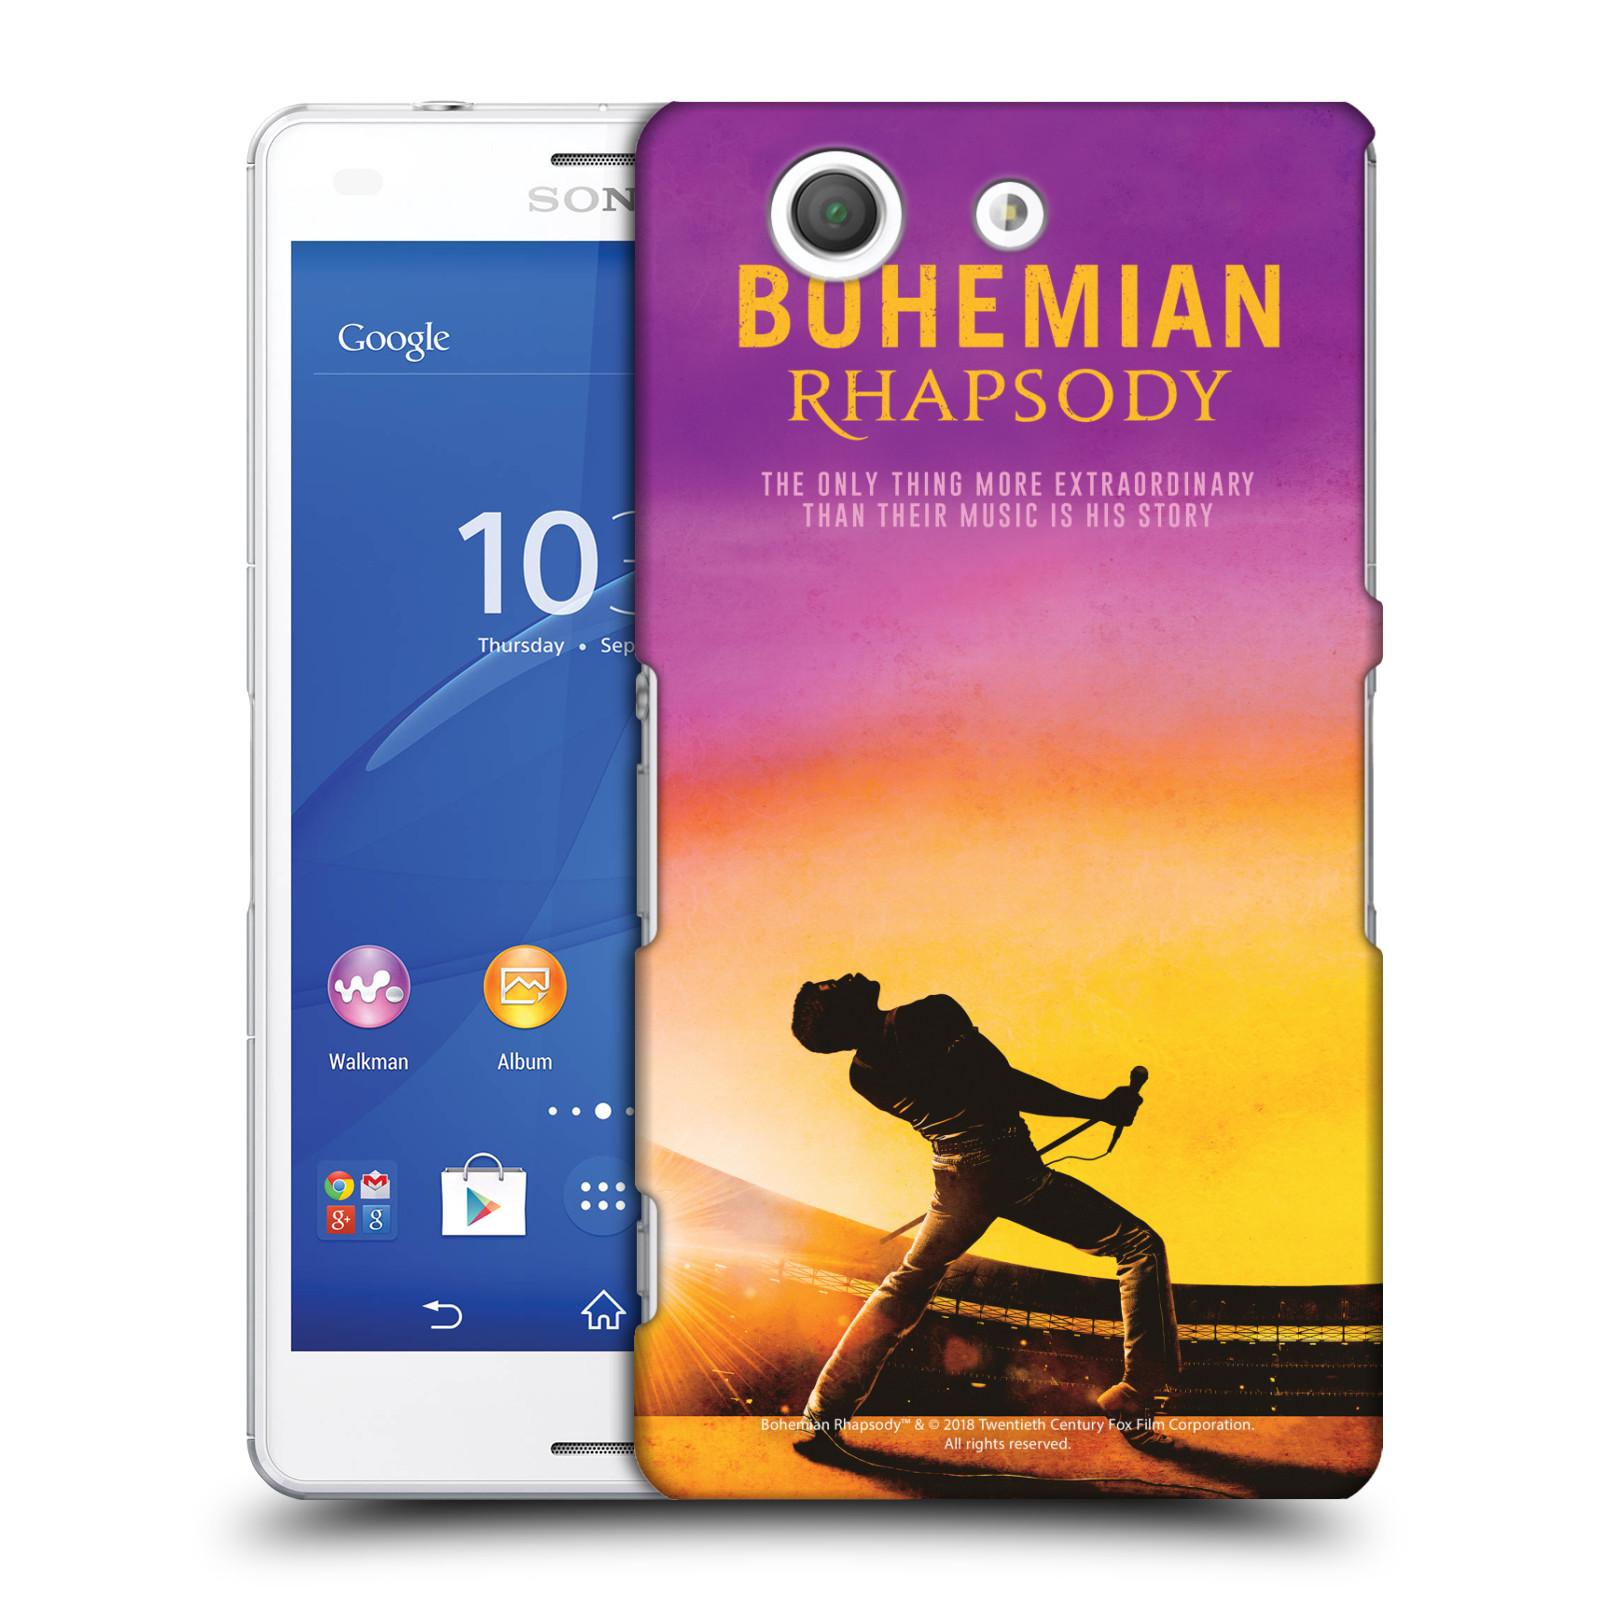 Pouzdro na mobil Sony Xperia Z3 COMPACT Filmový motiv Bohemian Rhapsody Queen